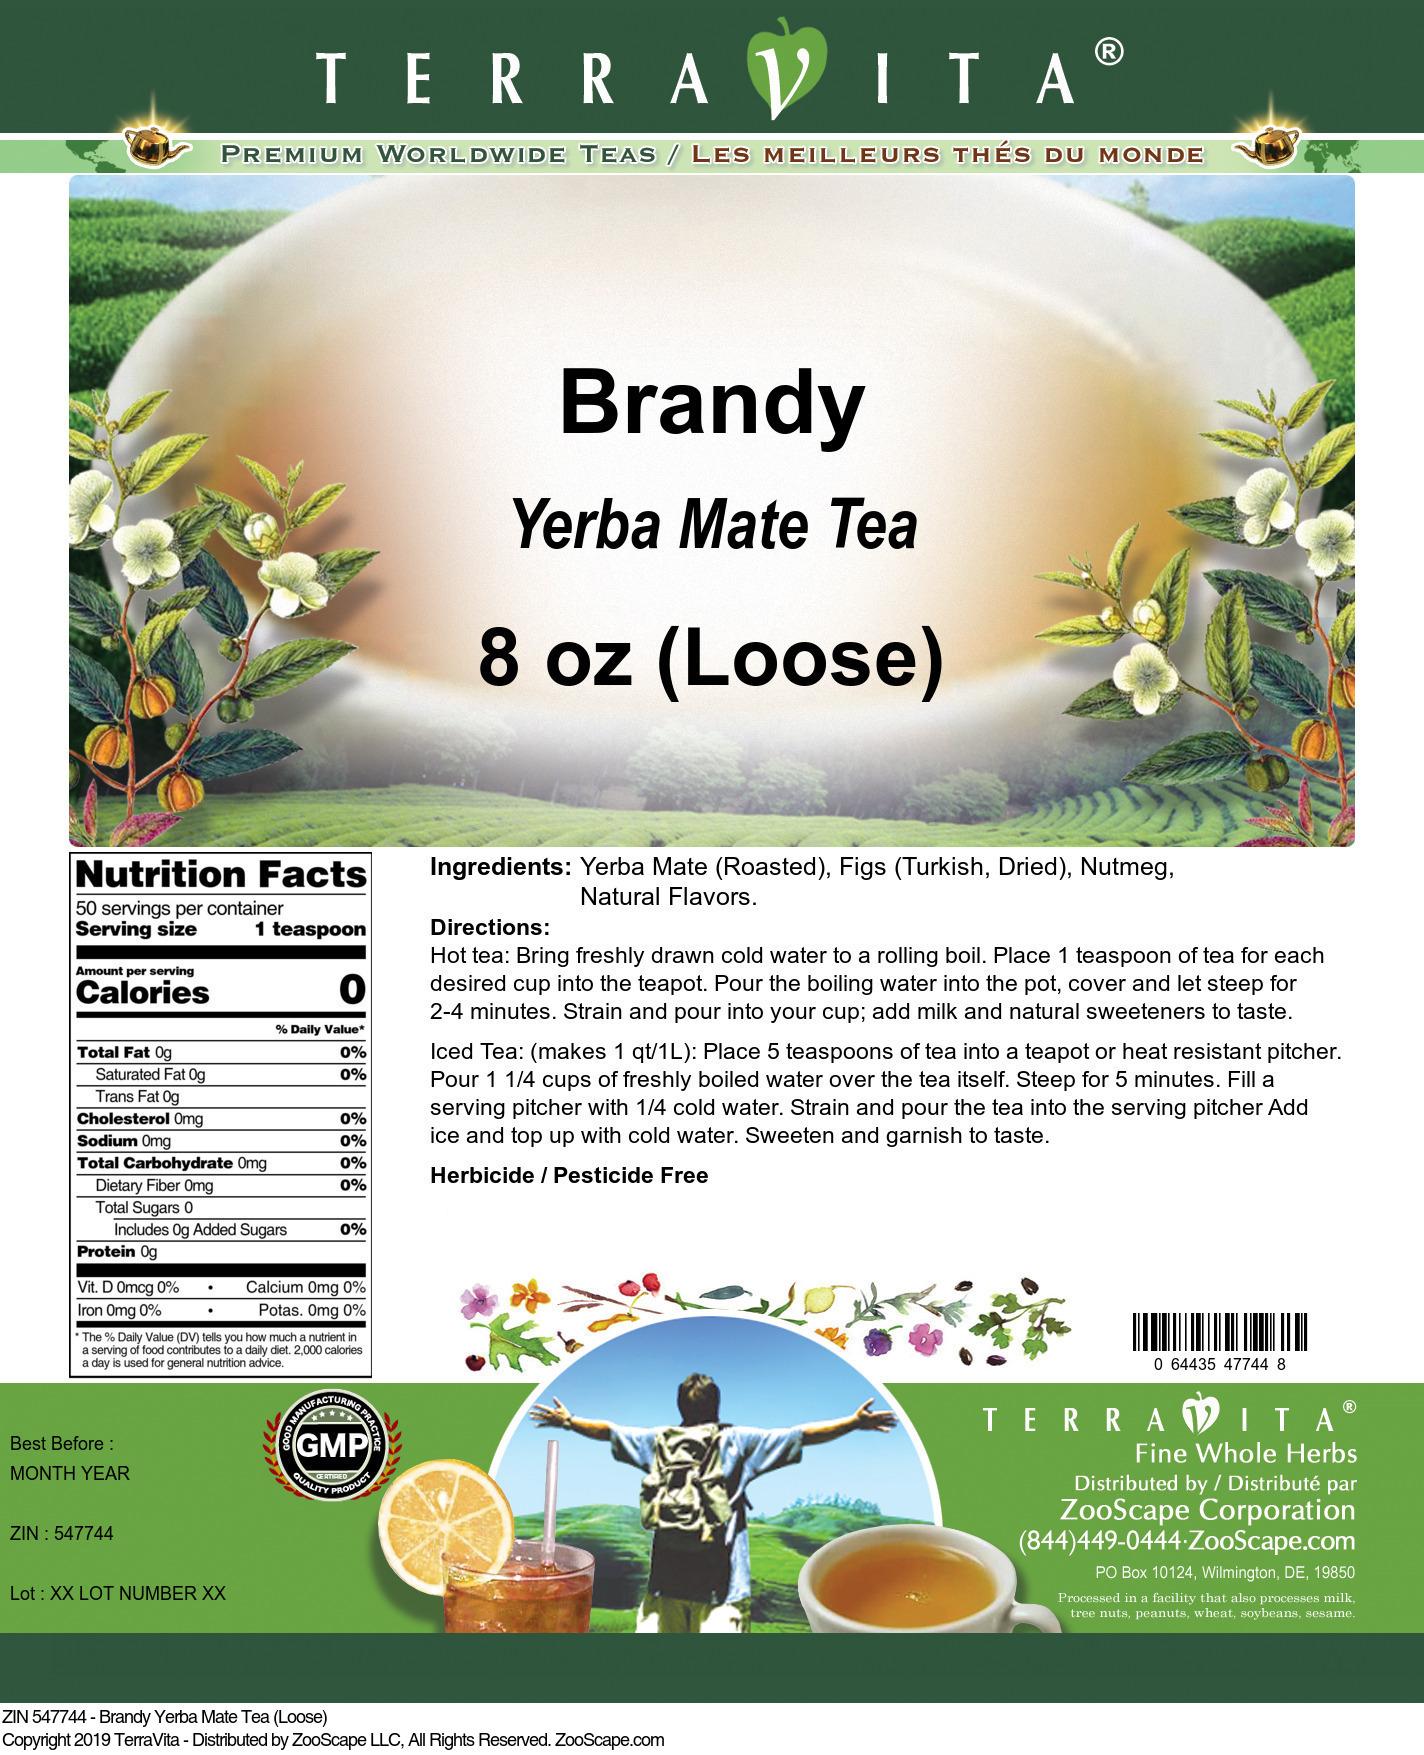 Brandy Yerba Mate Tea (Loose)